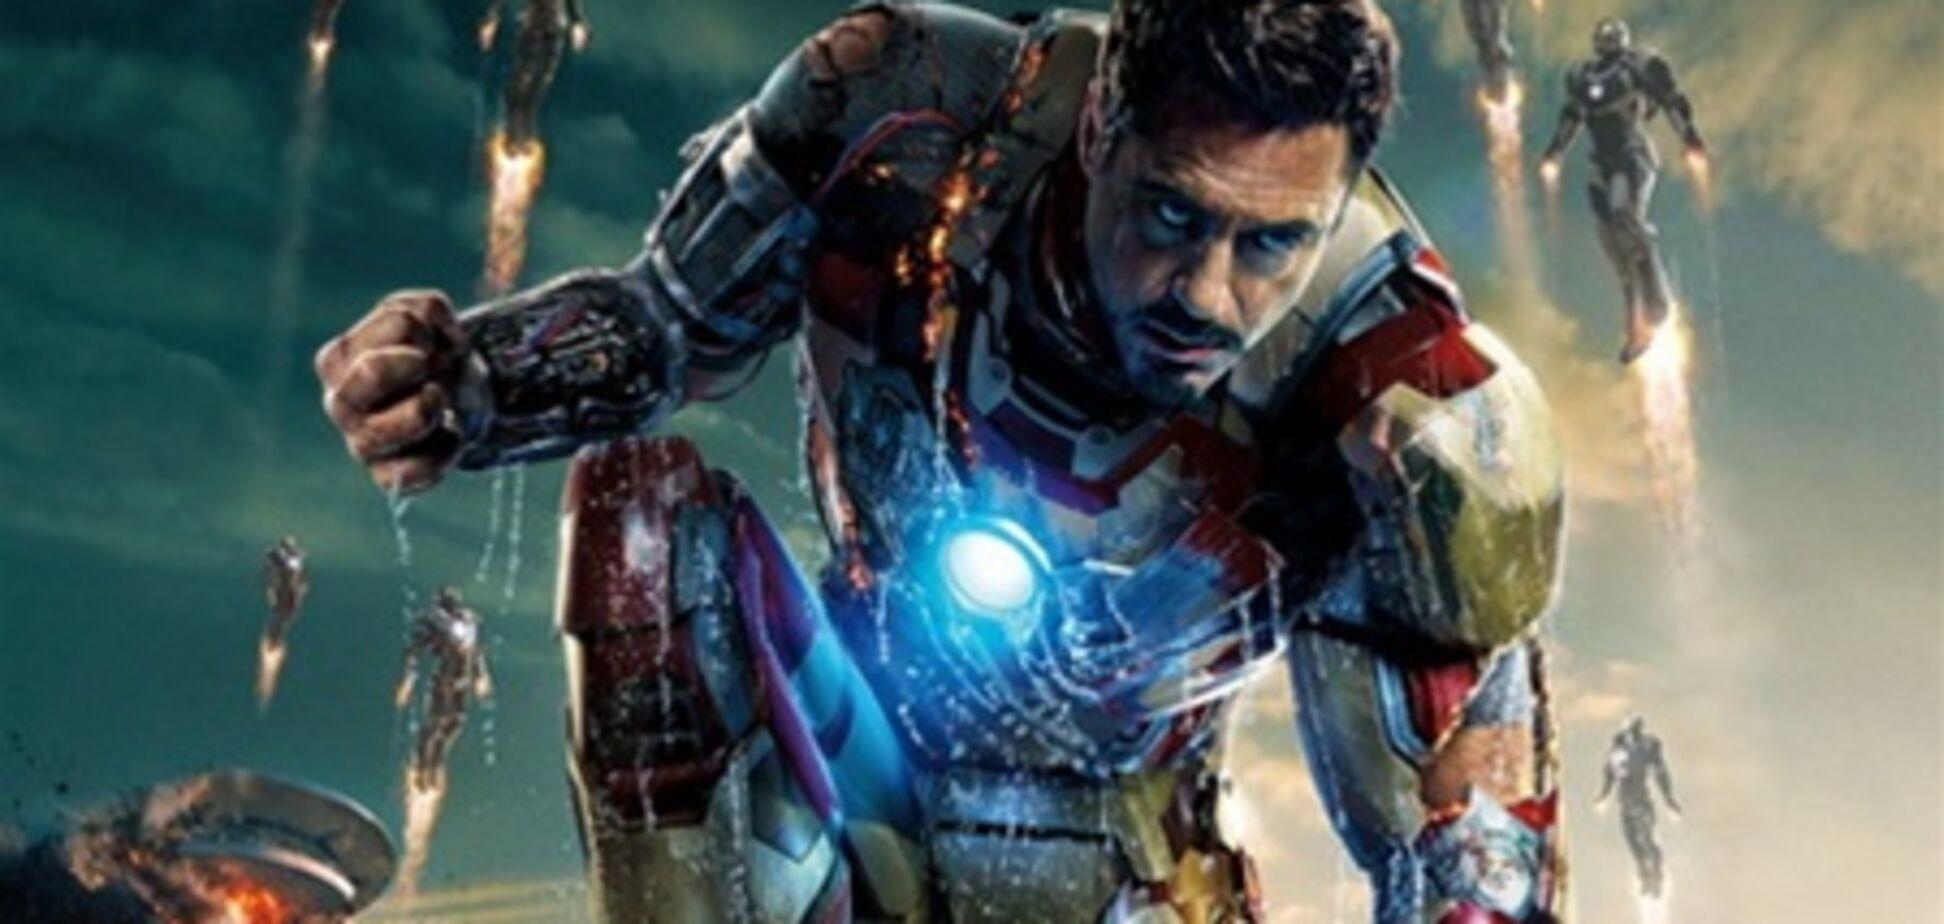 'Железный человек 3': конец Тони Старка?